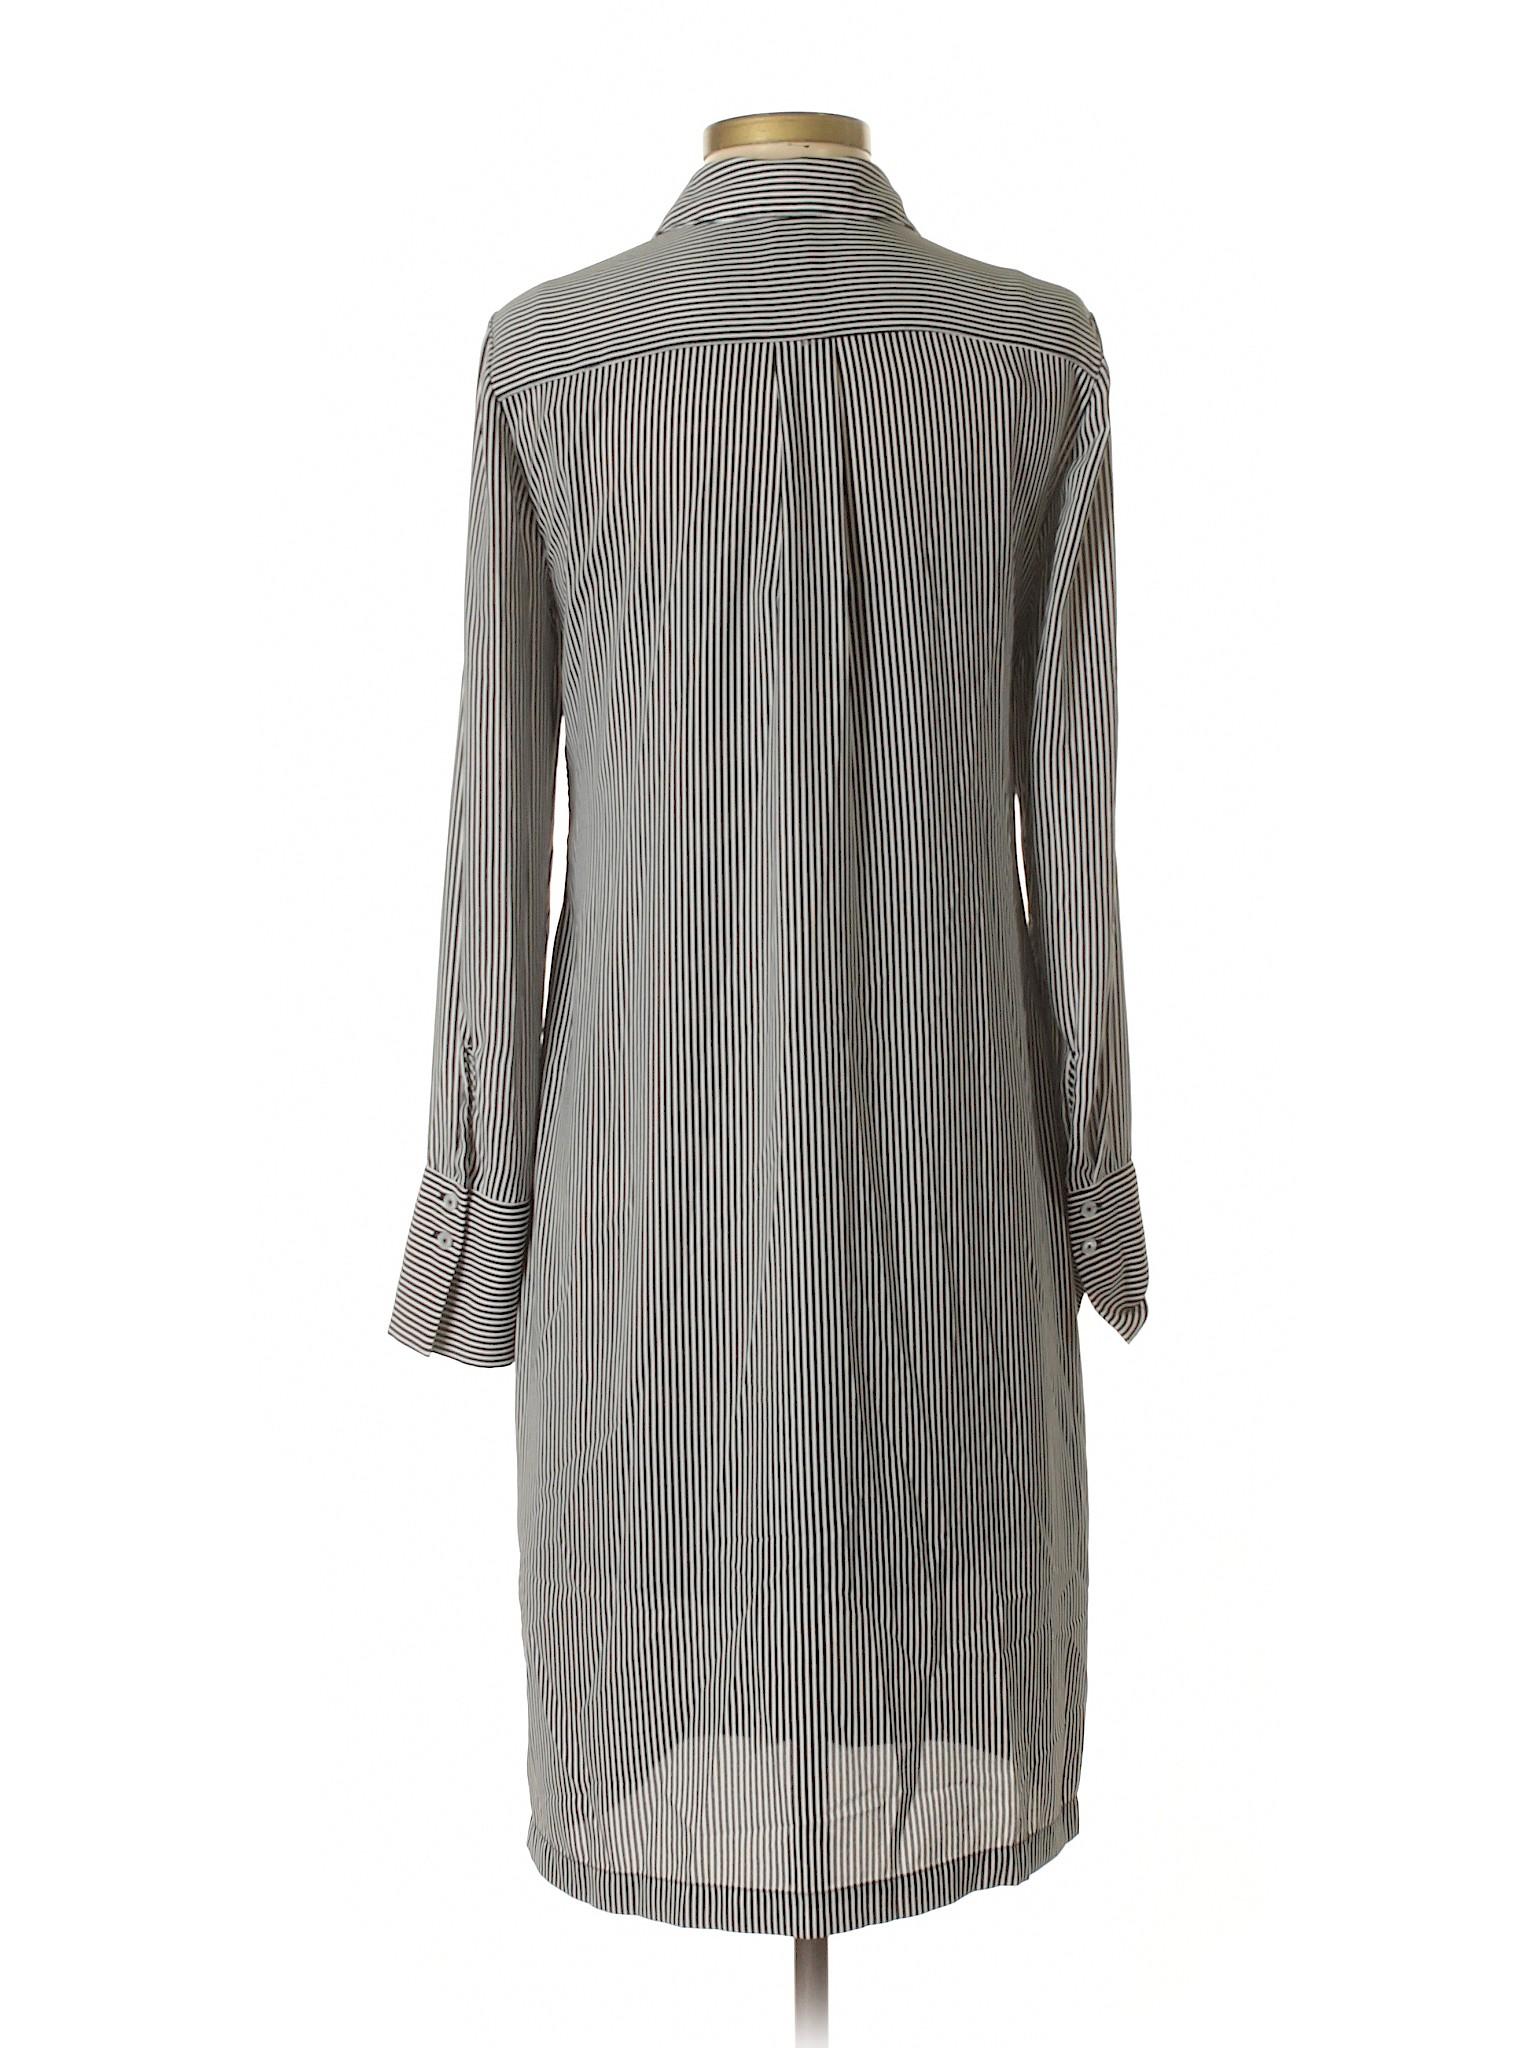 Market Casual House Dress Black Selling White FqgwtgP